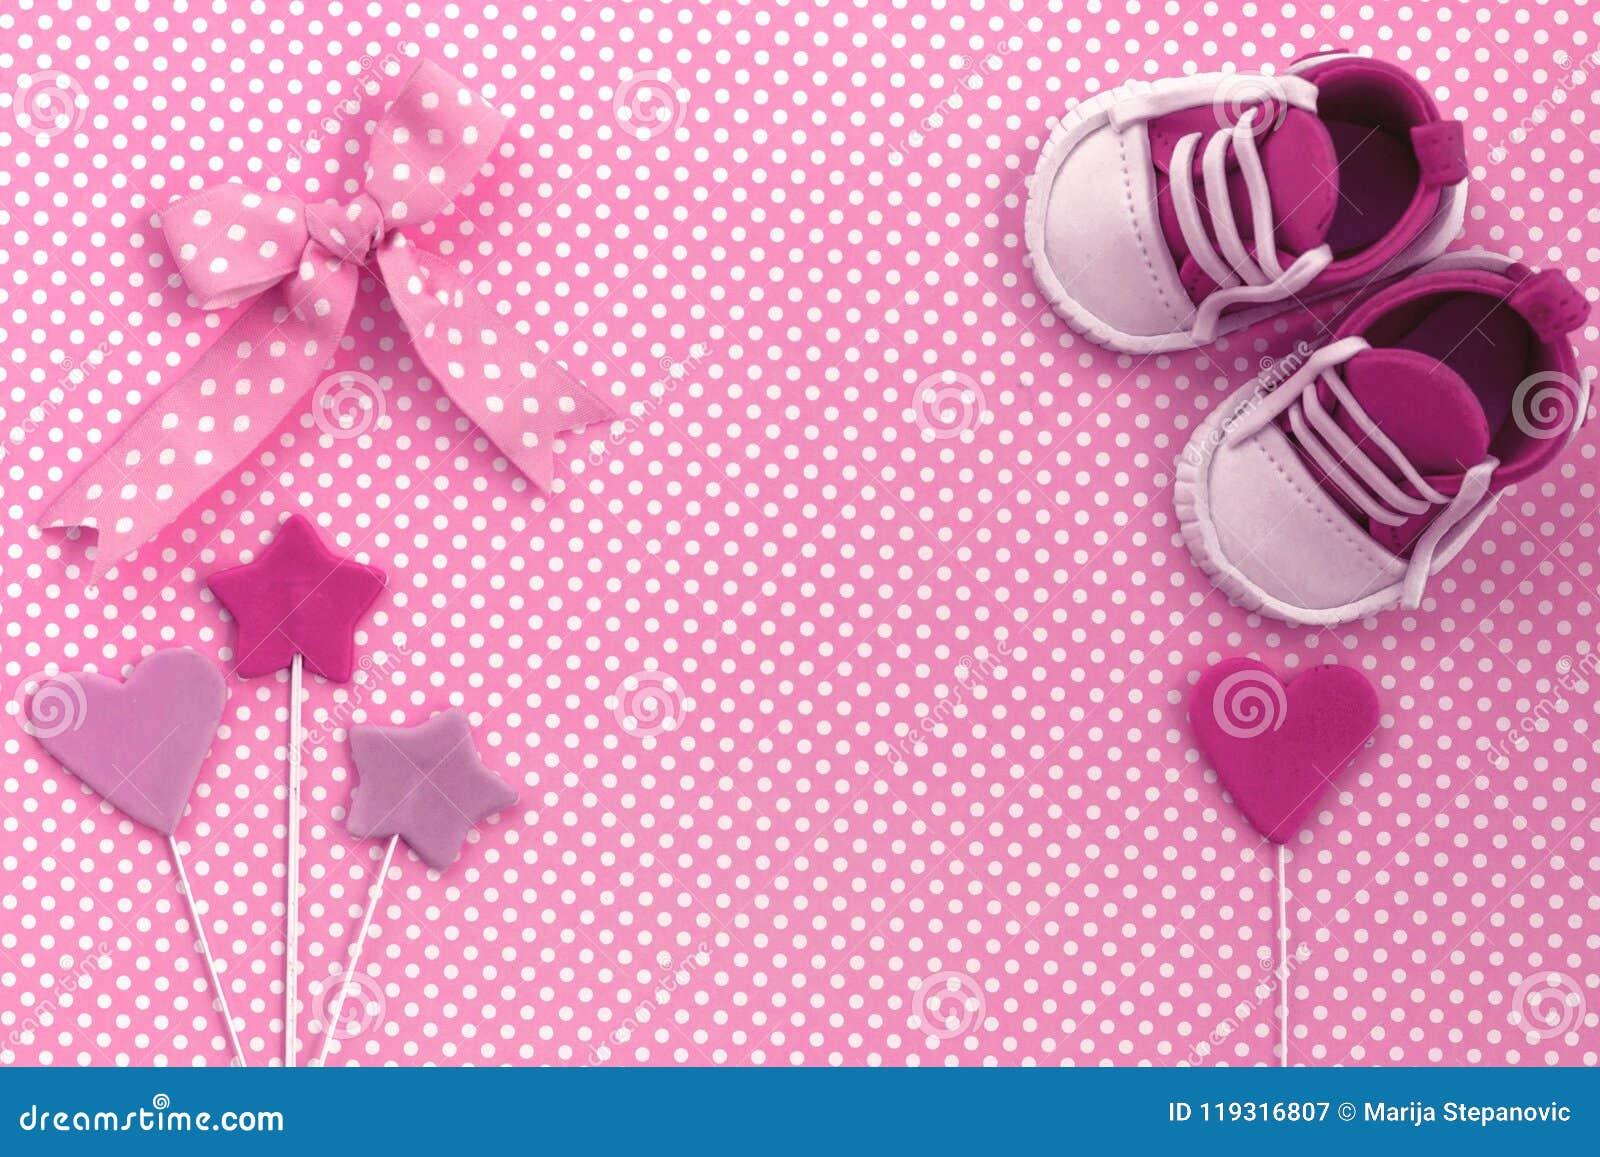 baby shower invitation  newborn background stock image